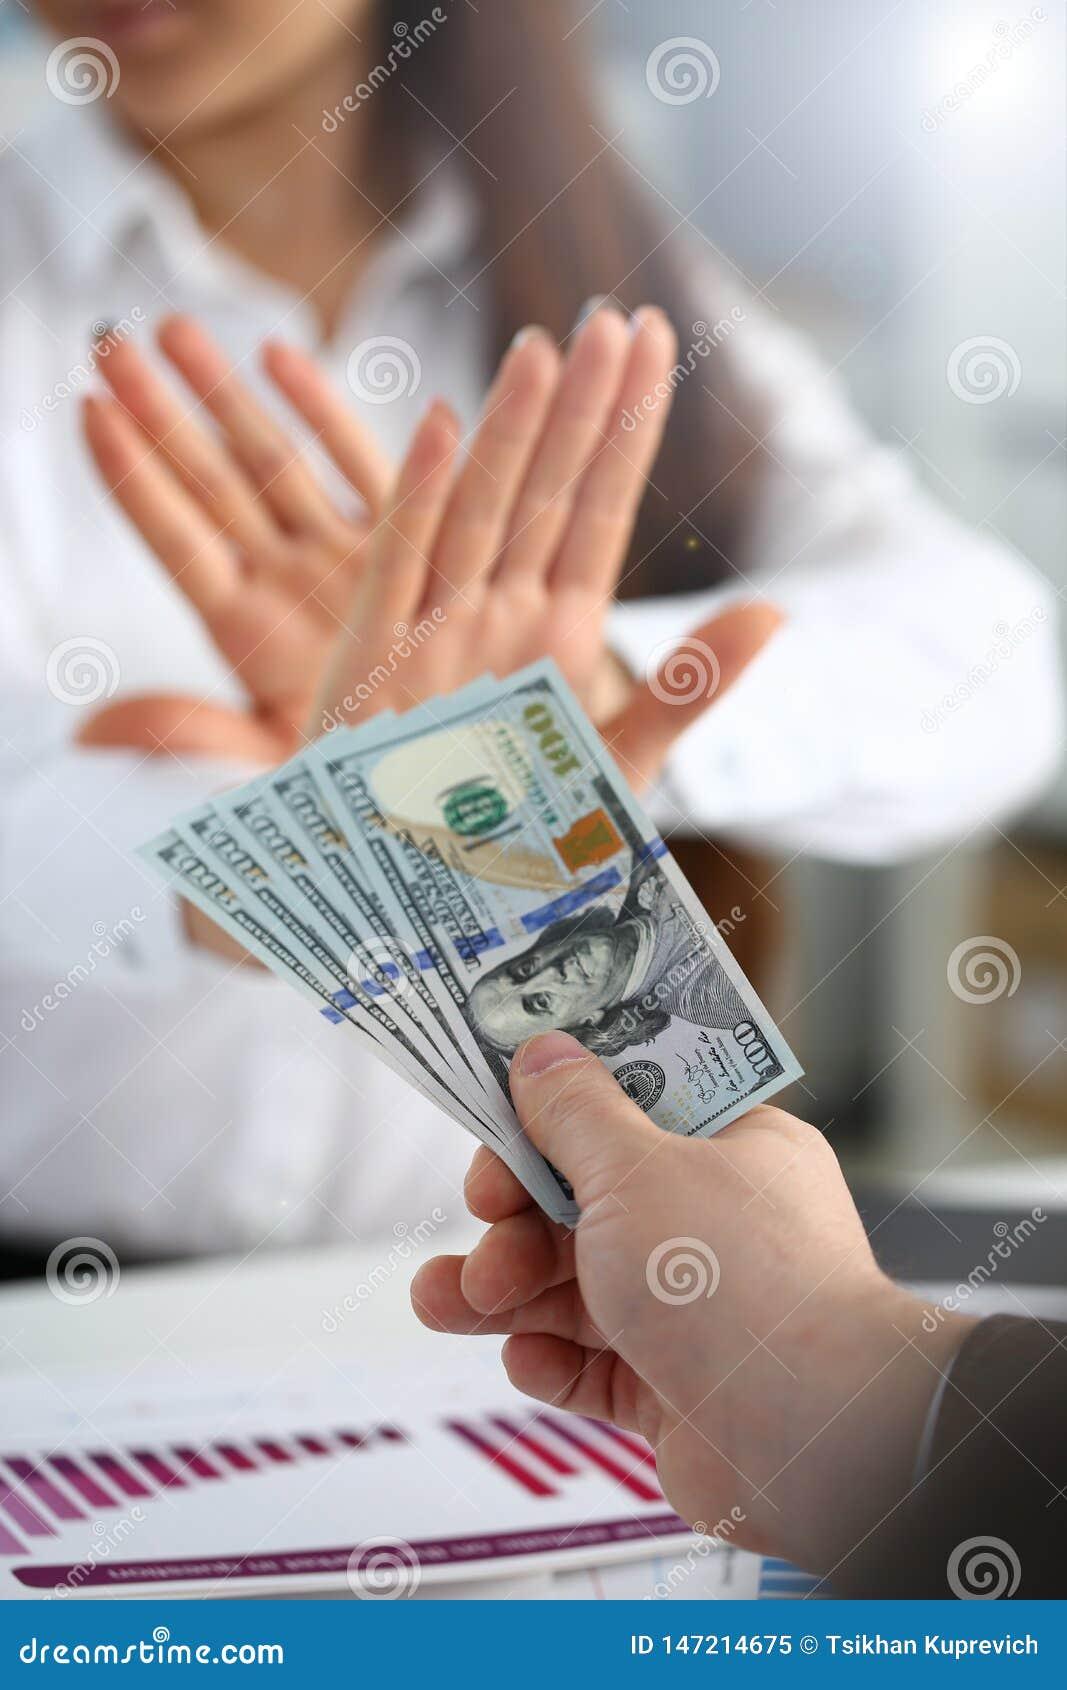 男性胳膊薪水束一百元钞票